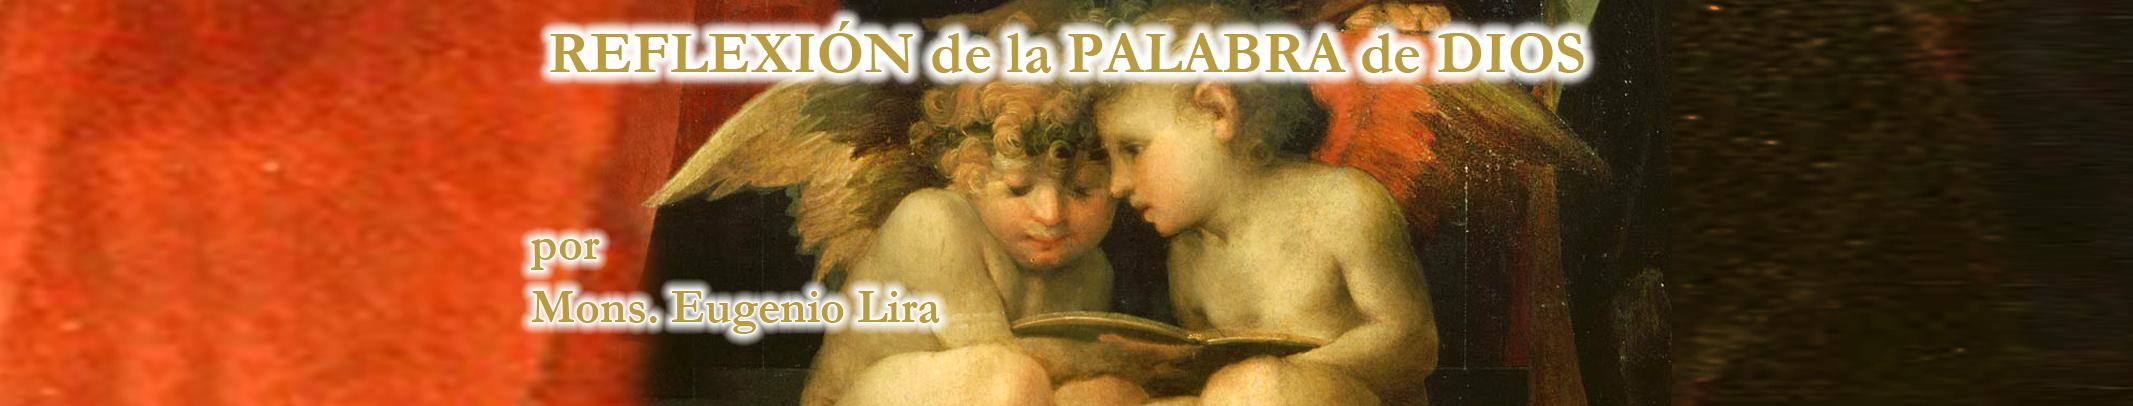 banderola-reflexion-PalabrB-1